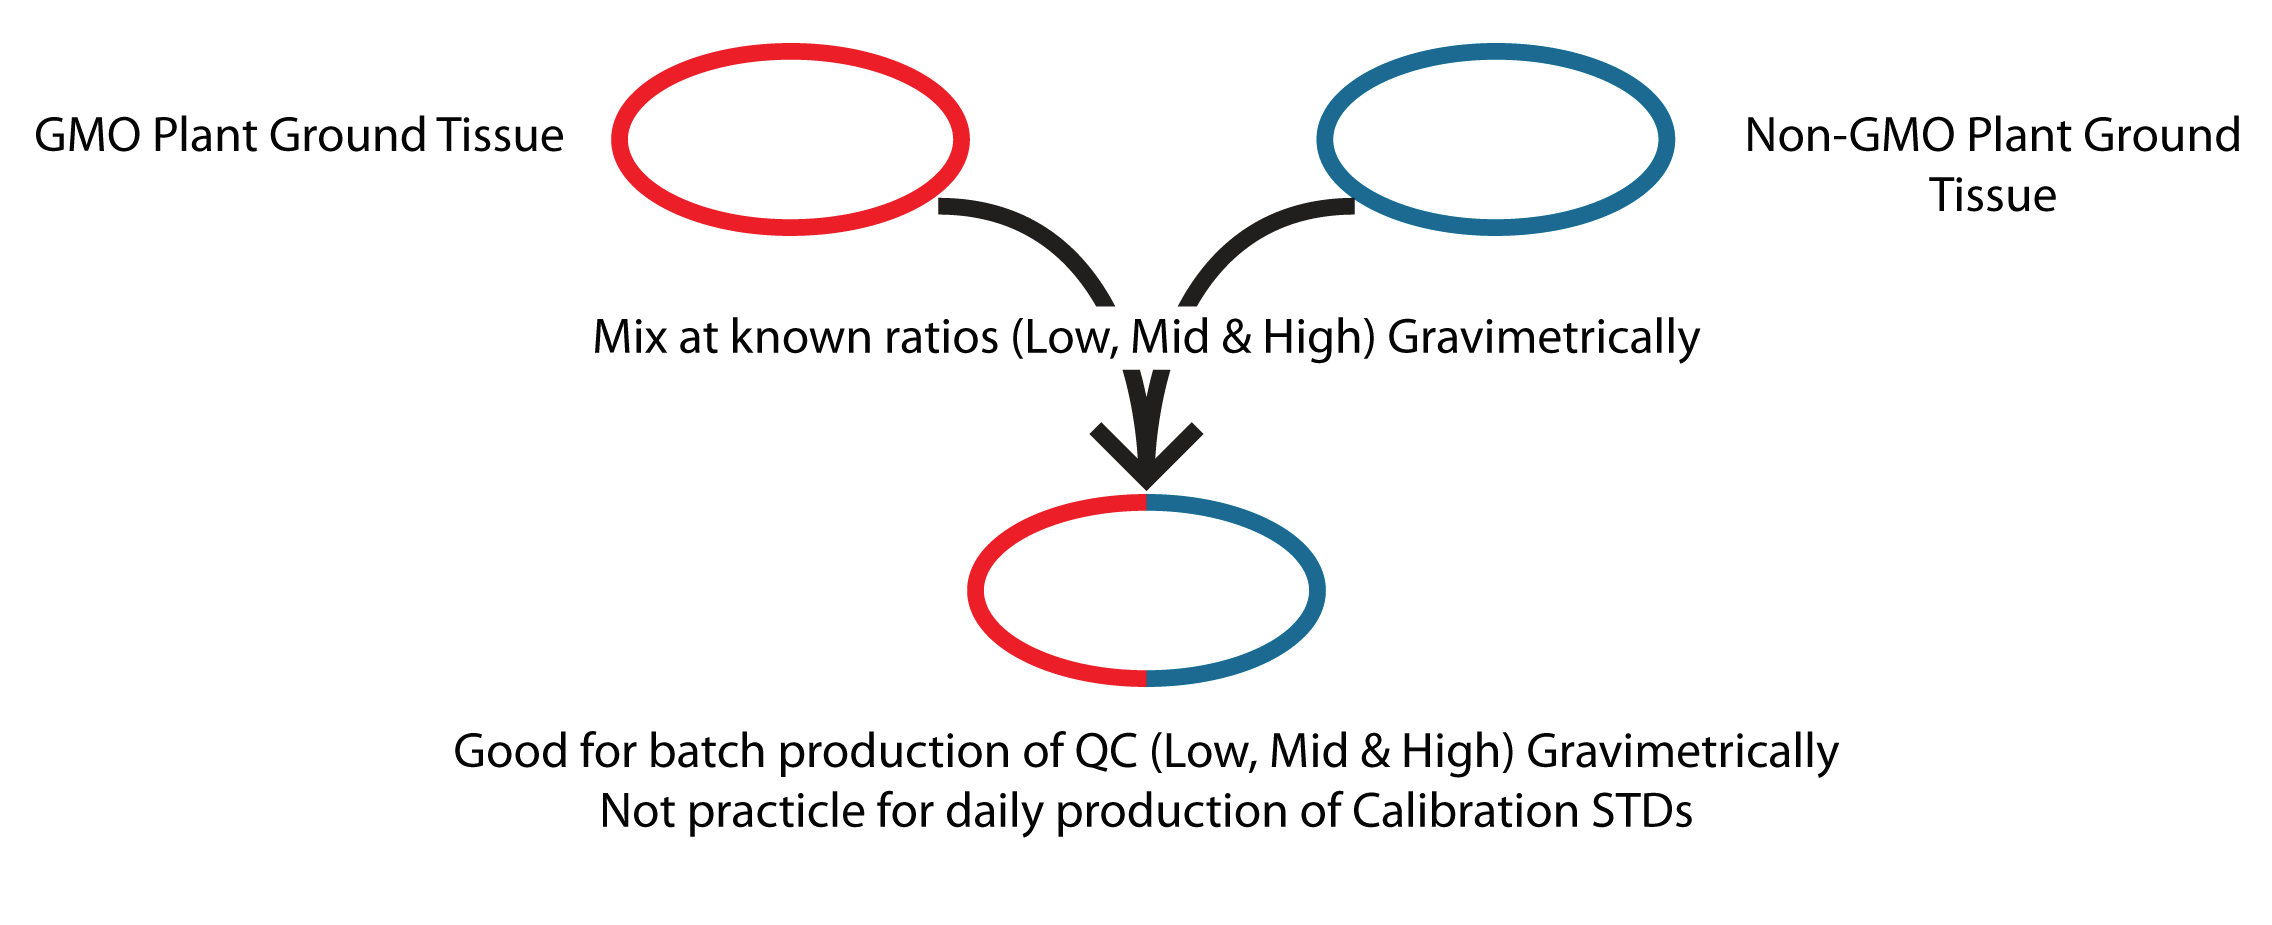 Figure 1. Graimetric approach for batch production of QC